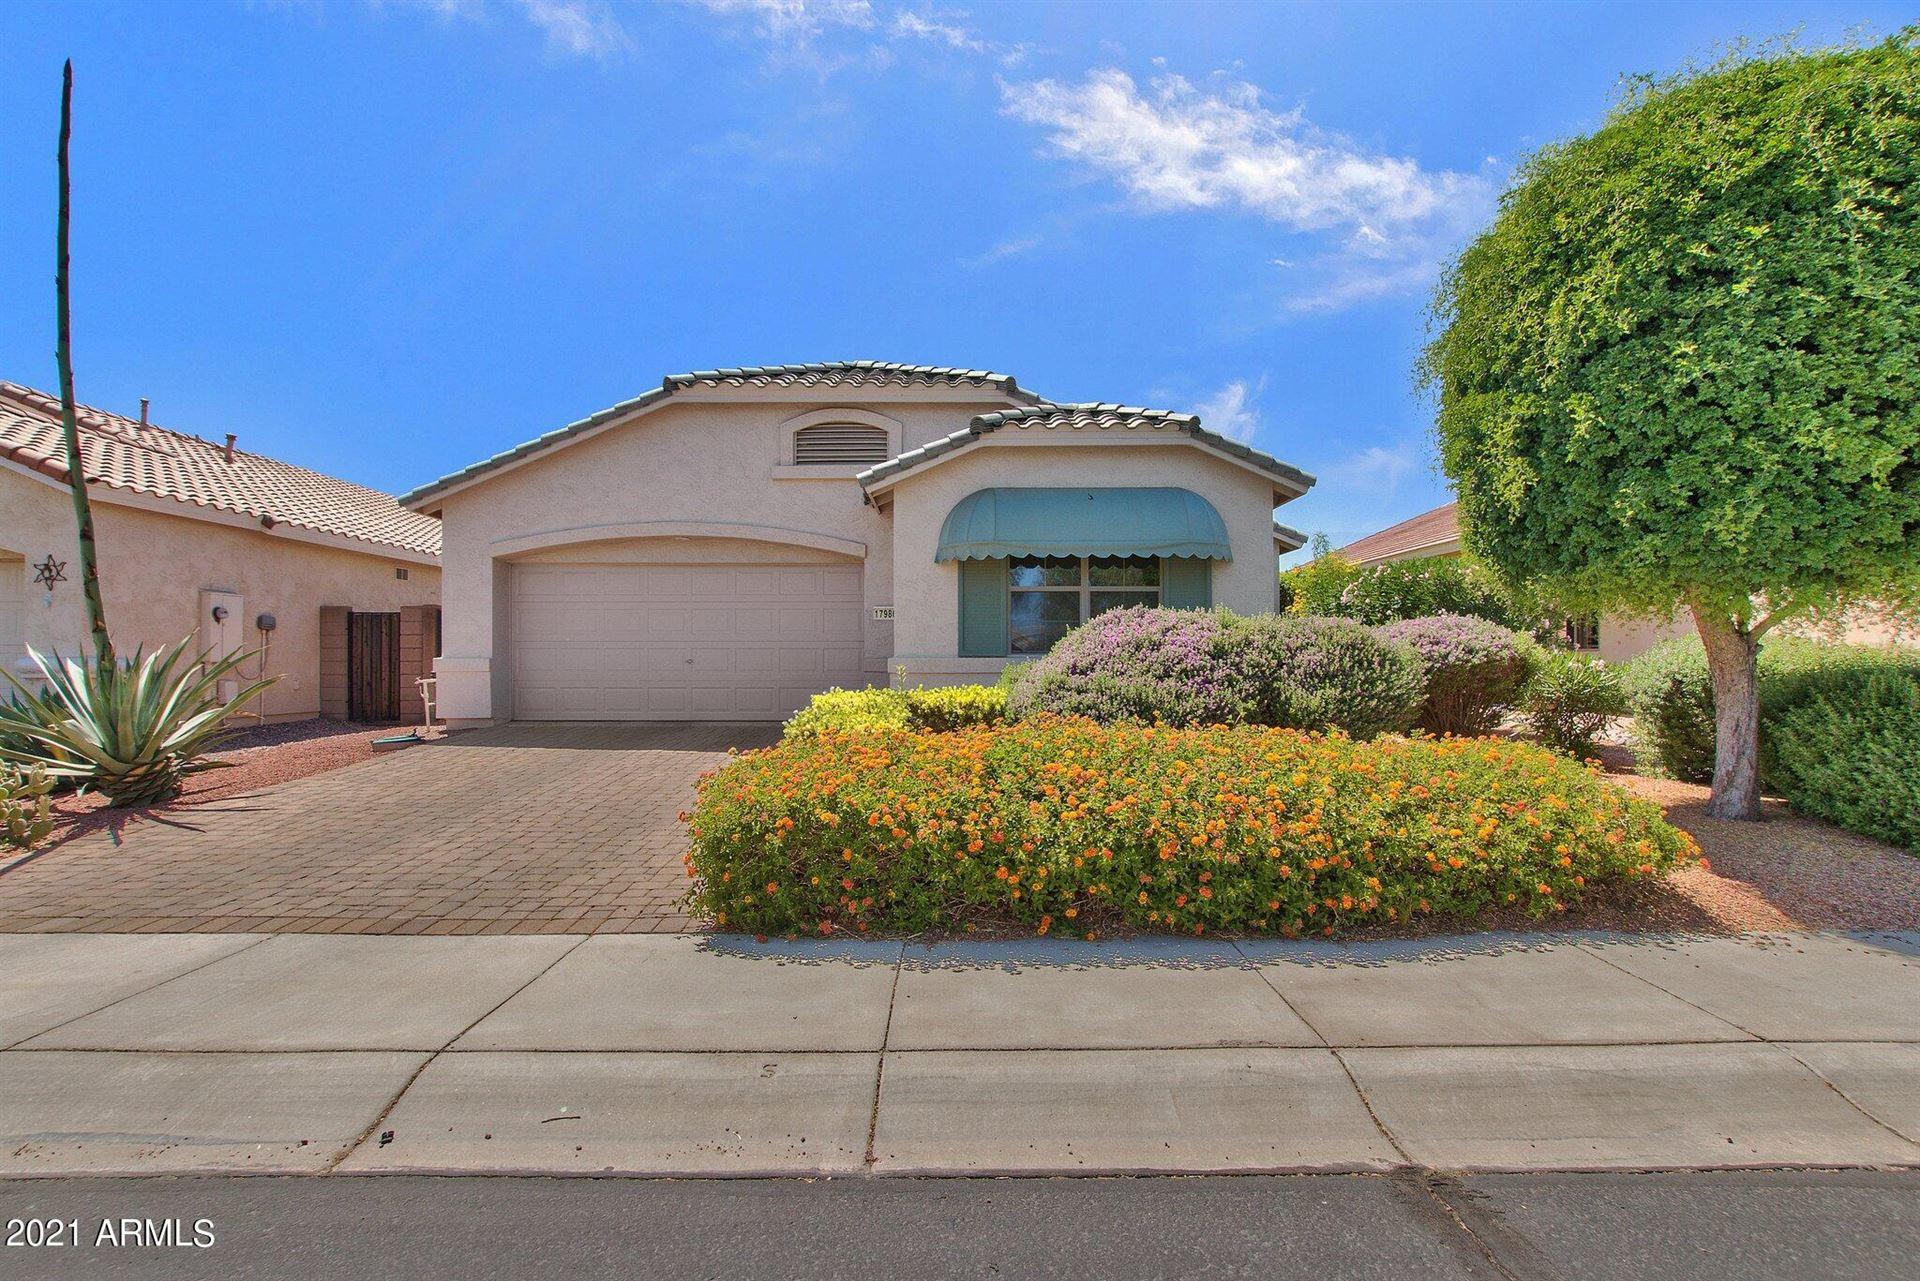 Photo of 17986 N JAVELINA Drive, Surprise, AZ 85374 (MLS # 6231275)